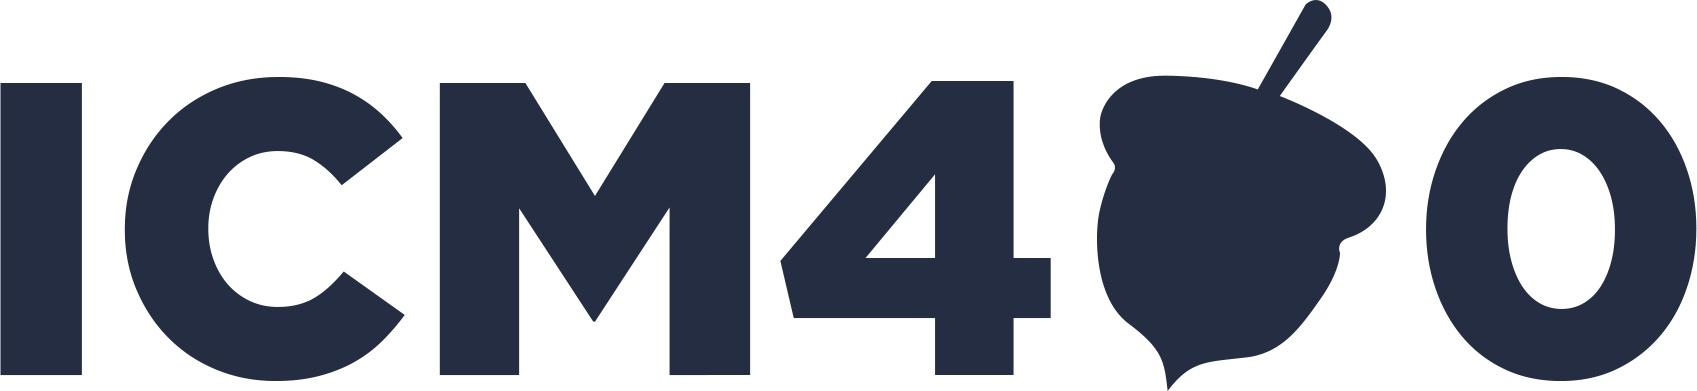 ICM400+Logo+Sample.jpg